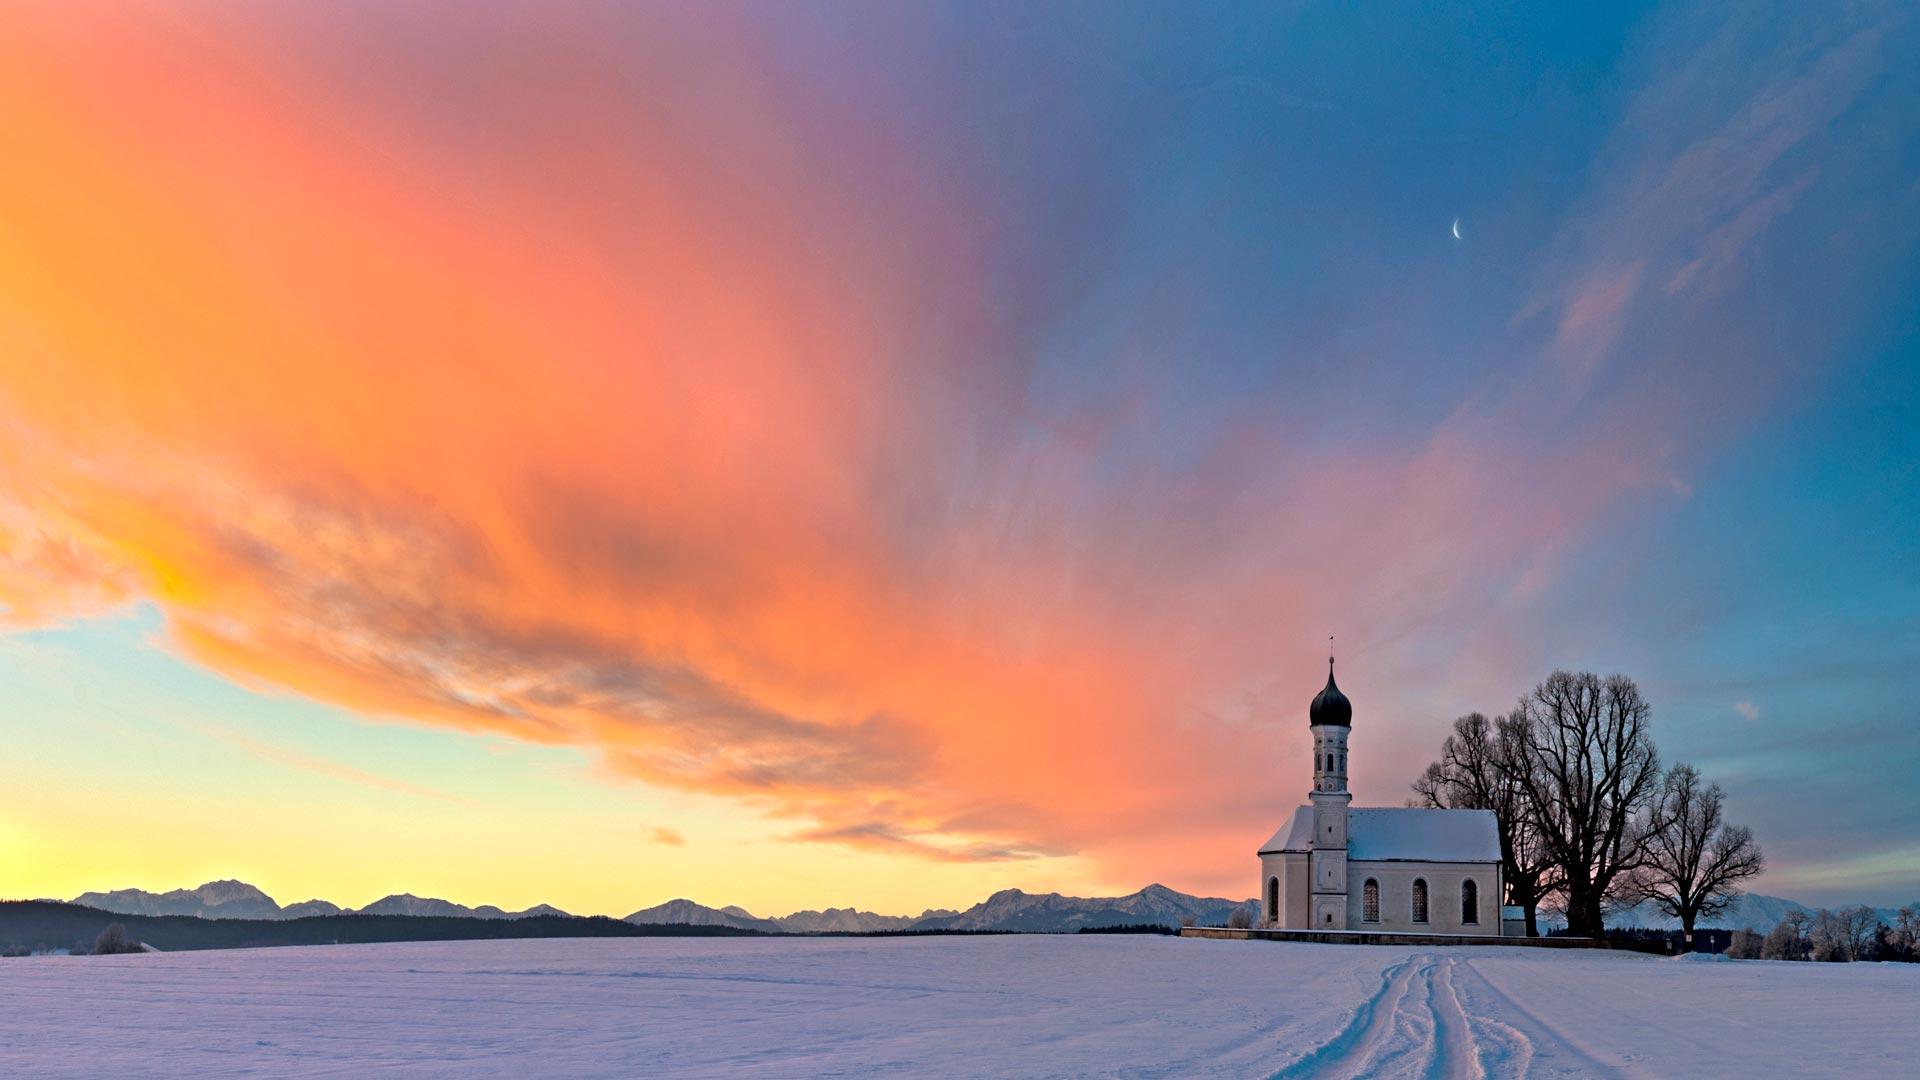 St. Andrä Kirche, Oberbayern